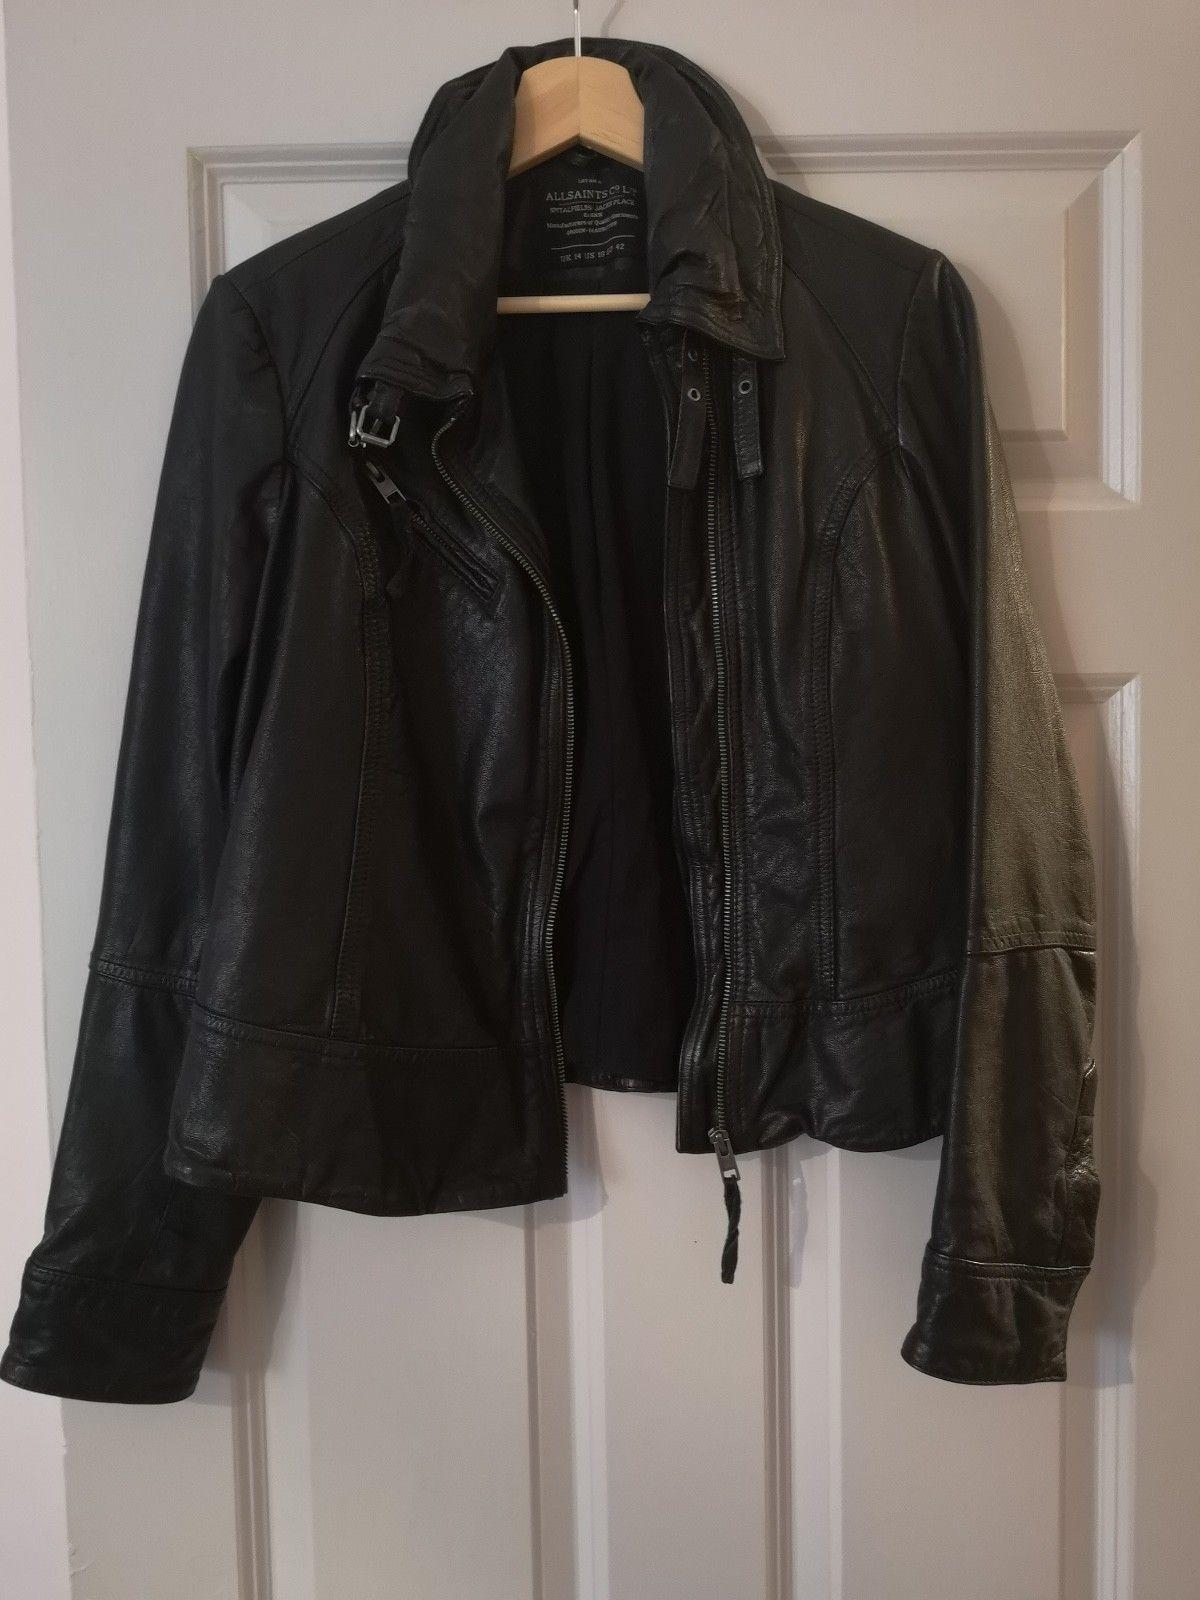 All Saints Black Leather Jacket Size 12 14 Womens